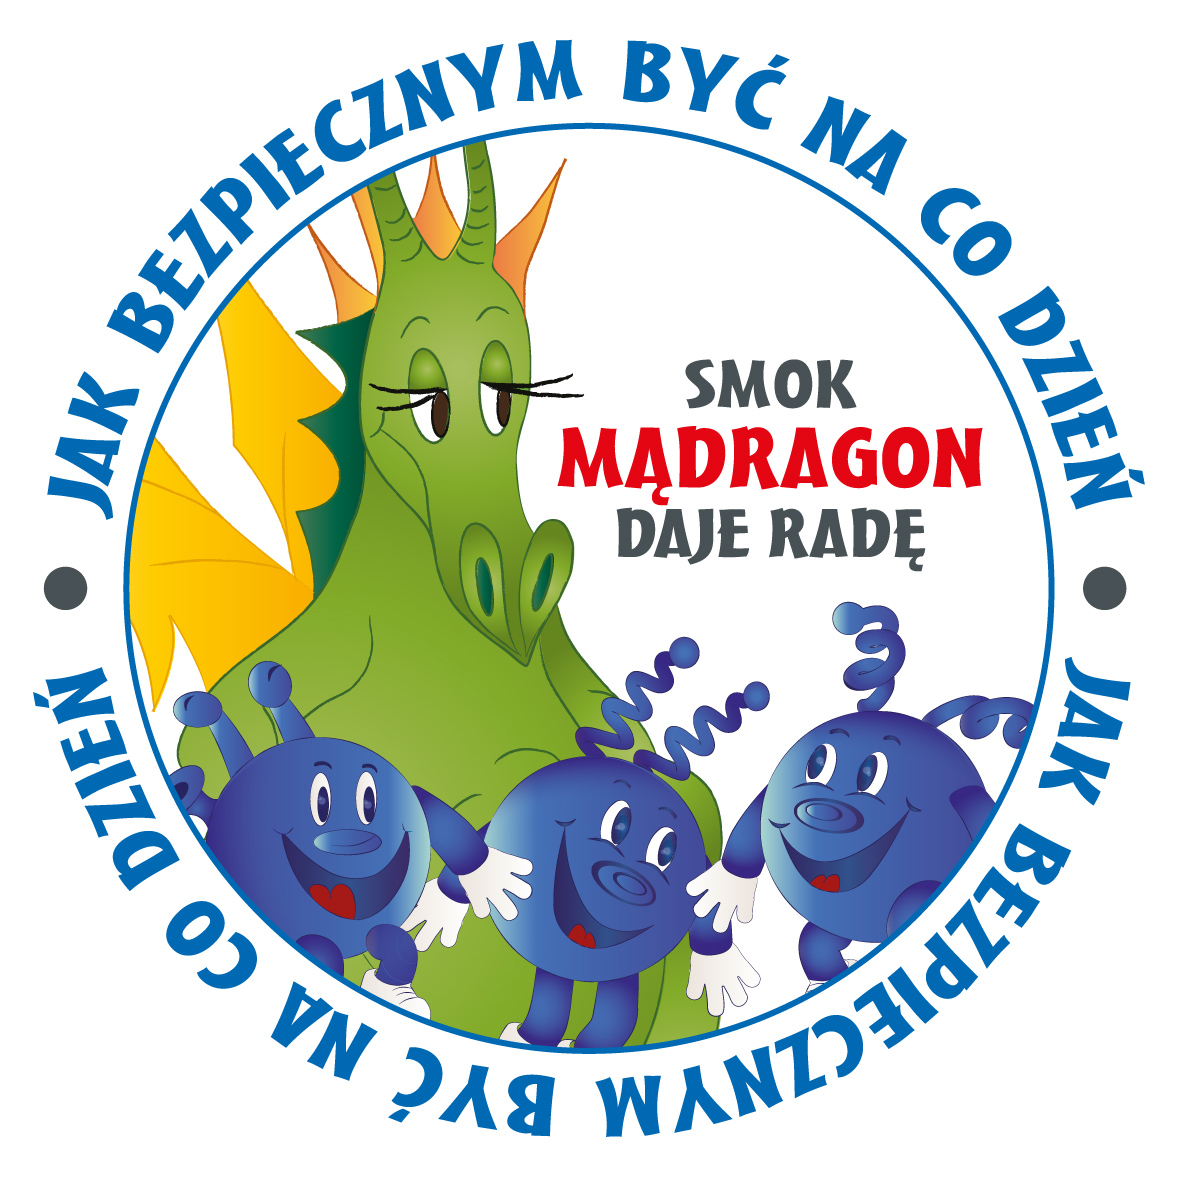 http://zyciezamoscia.pl/wp-content/uploads/2015/05/smok_madragon.jpg